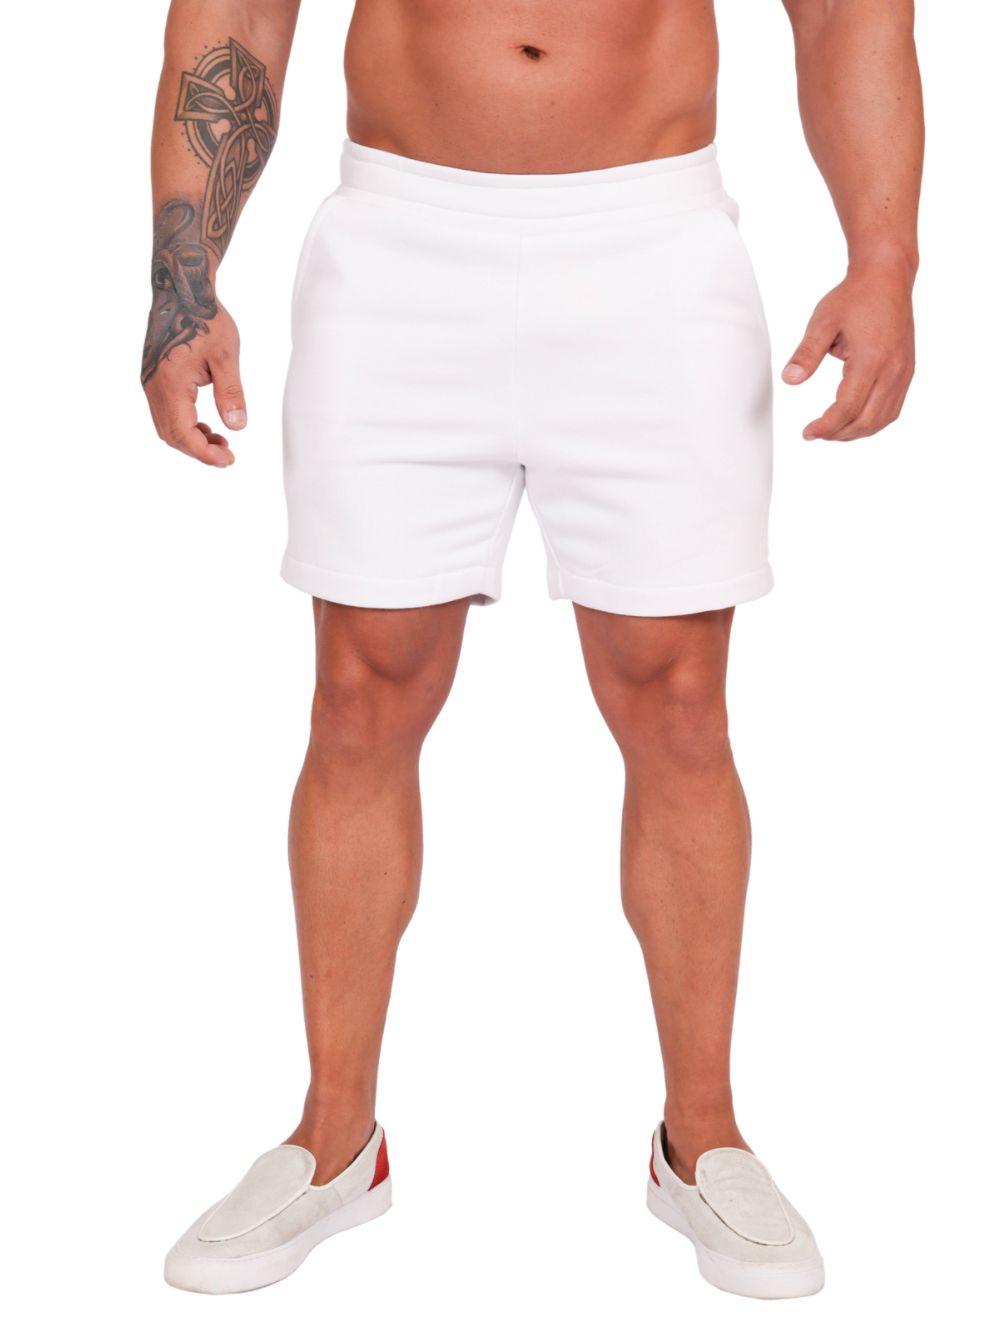 Bermuda Masculina em Moletom Branco